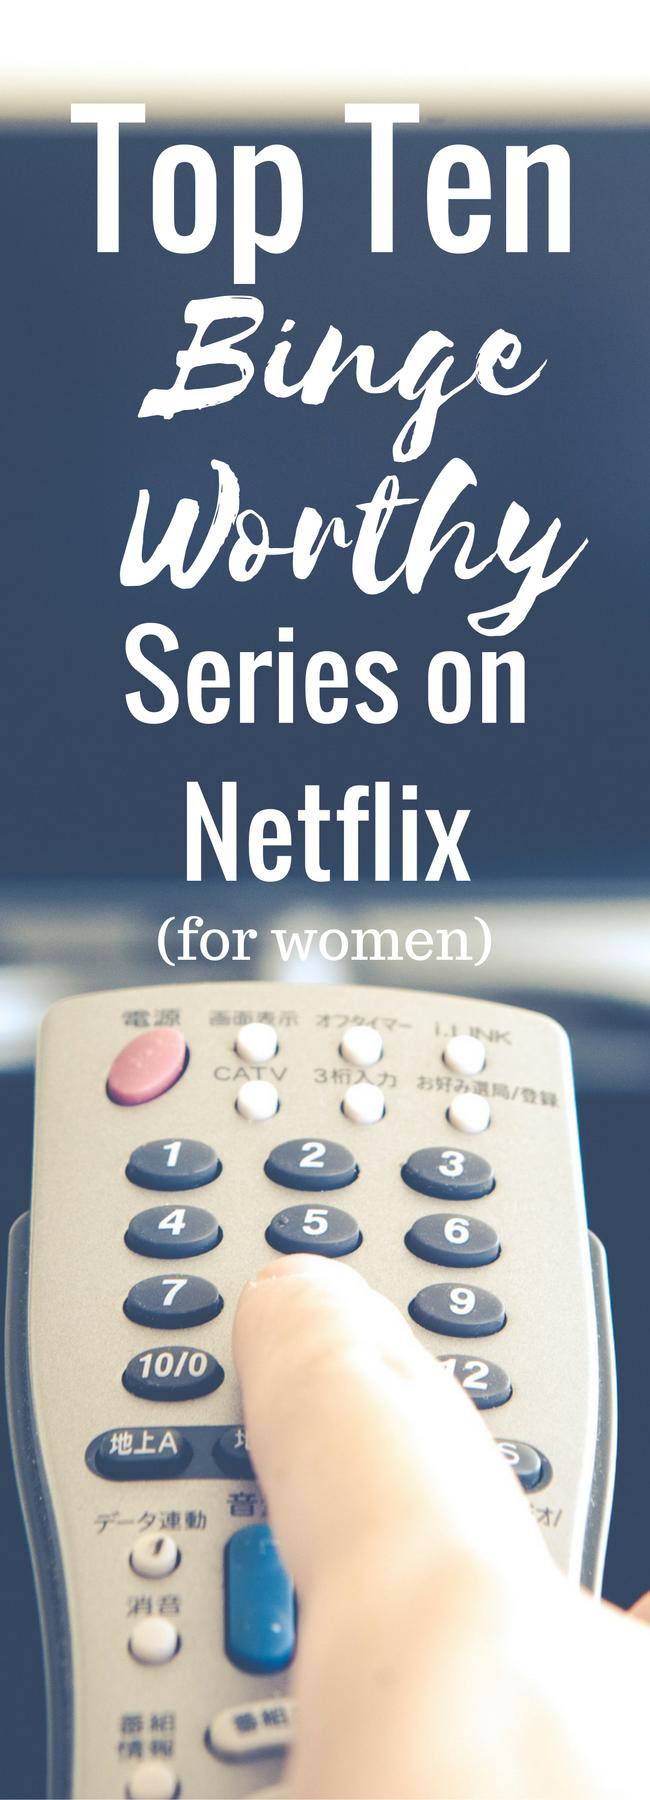 Top 10 Binge Worthy Shows on Netflix #seriesonnetflix